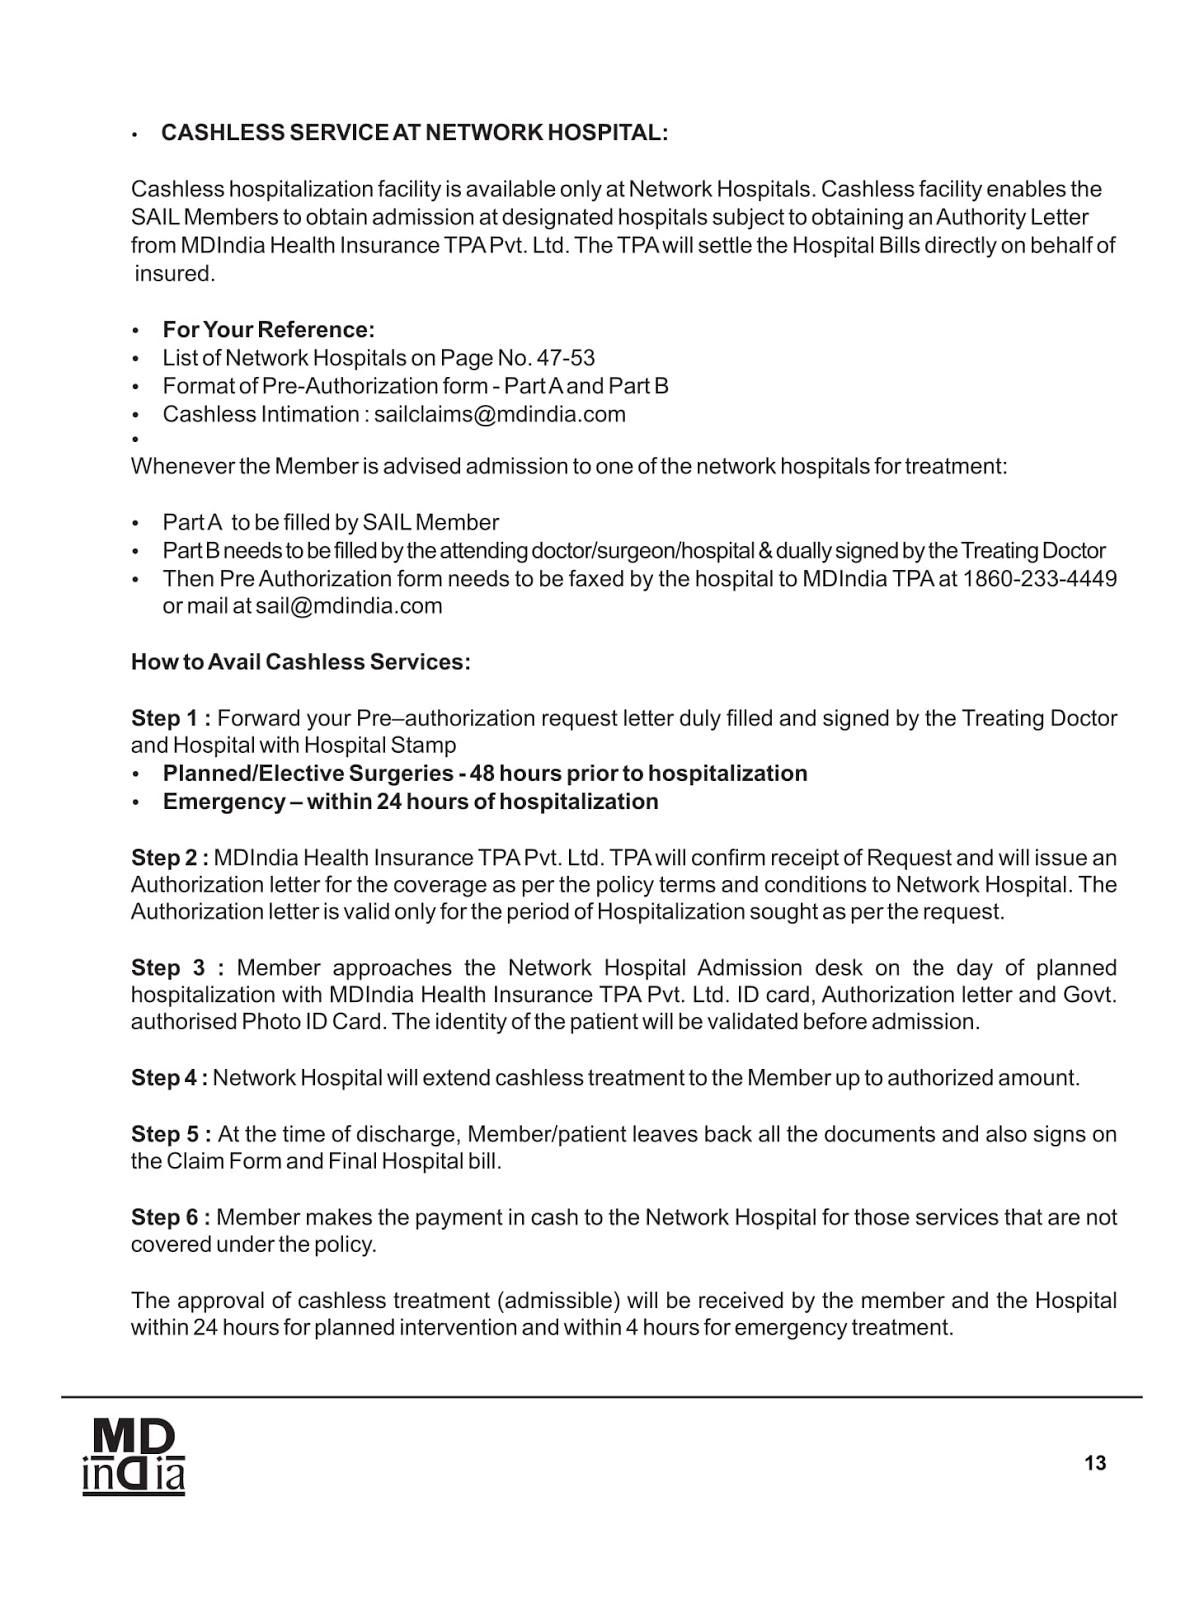 mediclaim policy receipt format vatoz atozdevelopment co